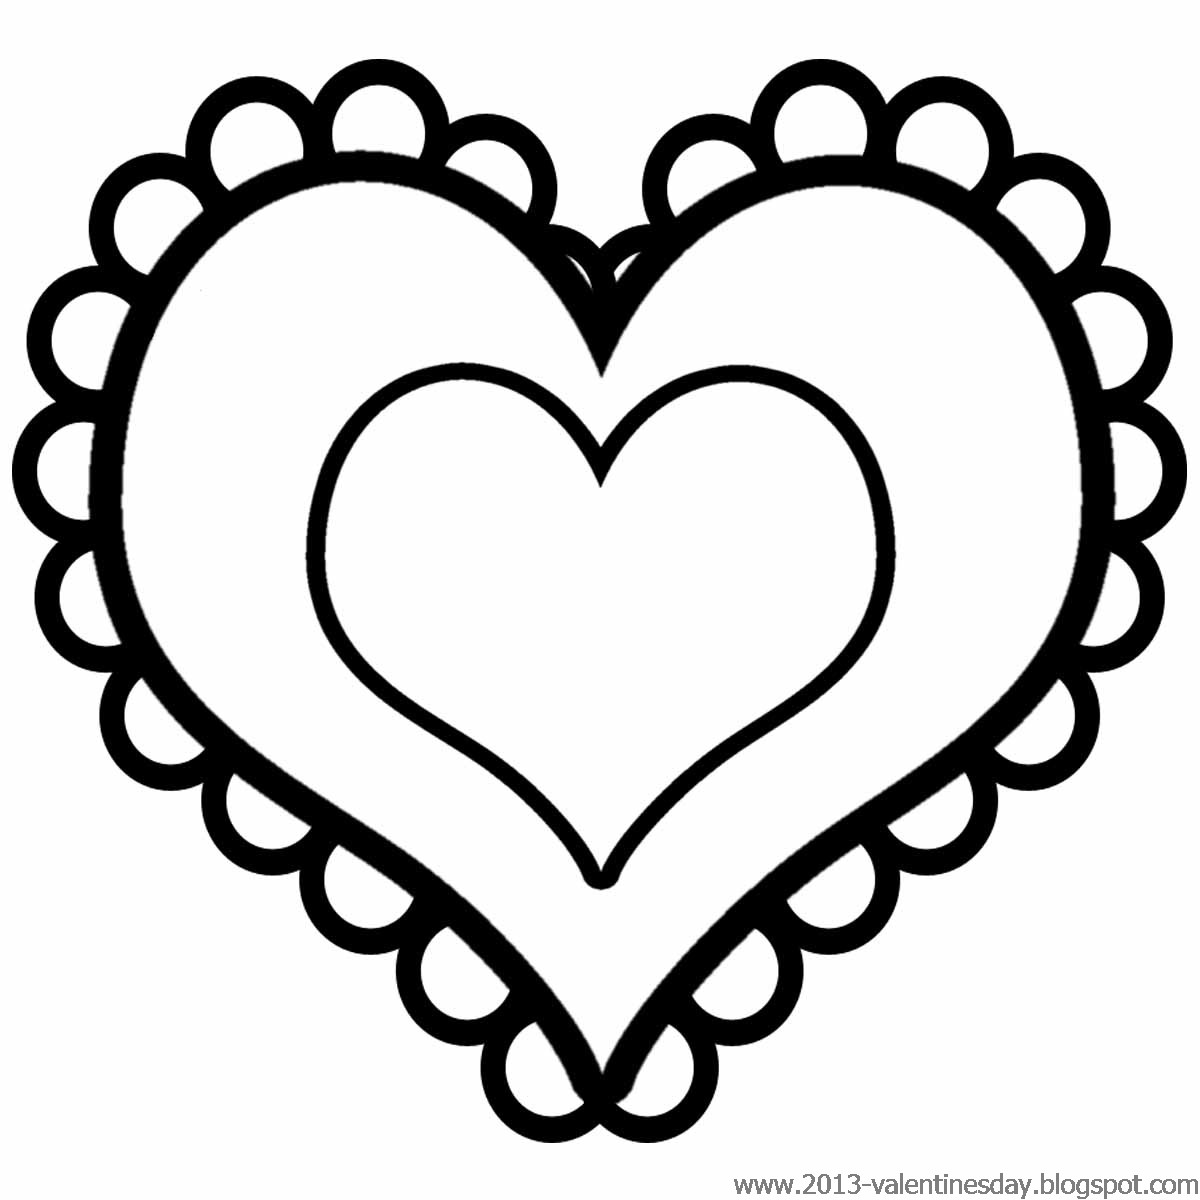 Heart Black And White Heart Black And Wh-Heart black and white heart black and white clipart-13